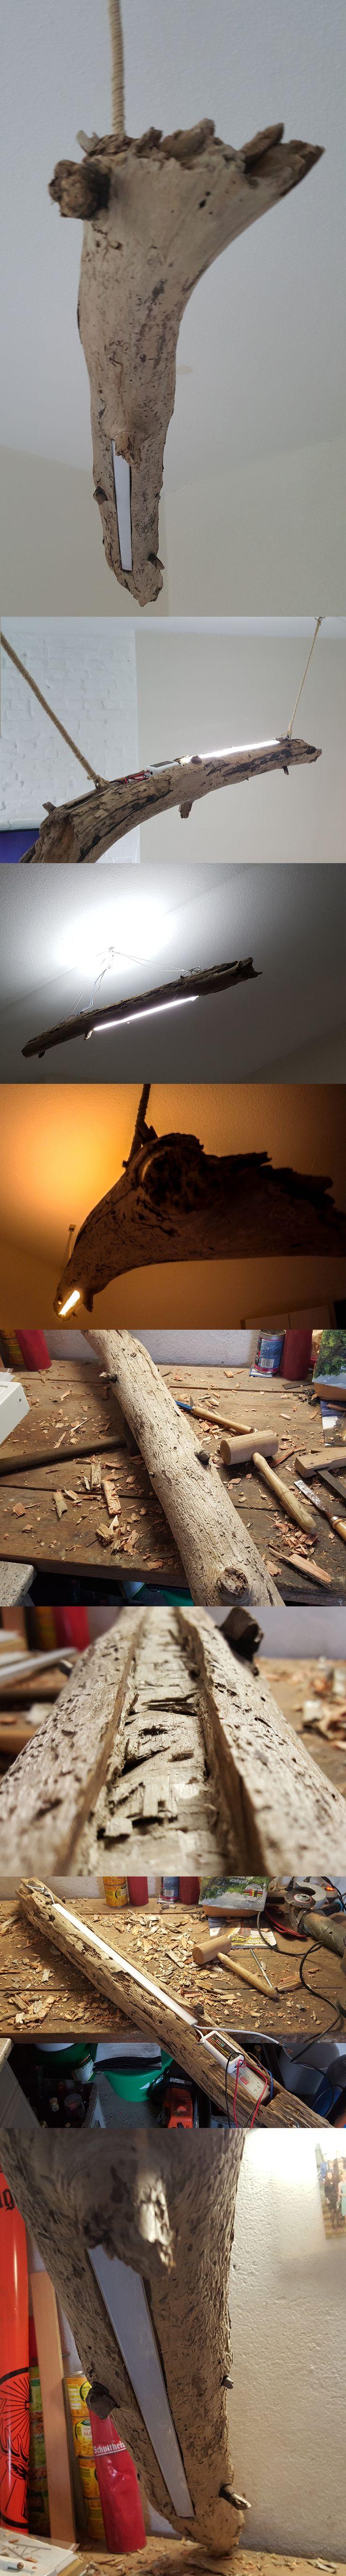 228 best Lampen aus Naturmaterialien | Natural Materials images on ...